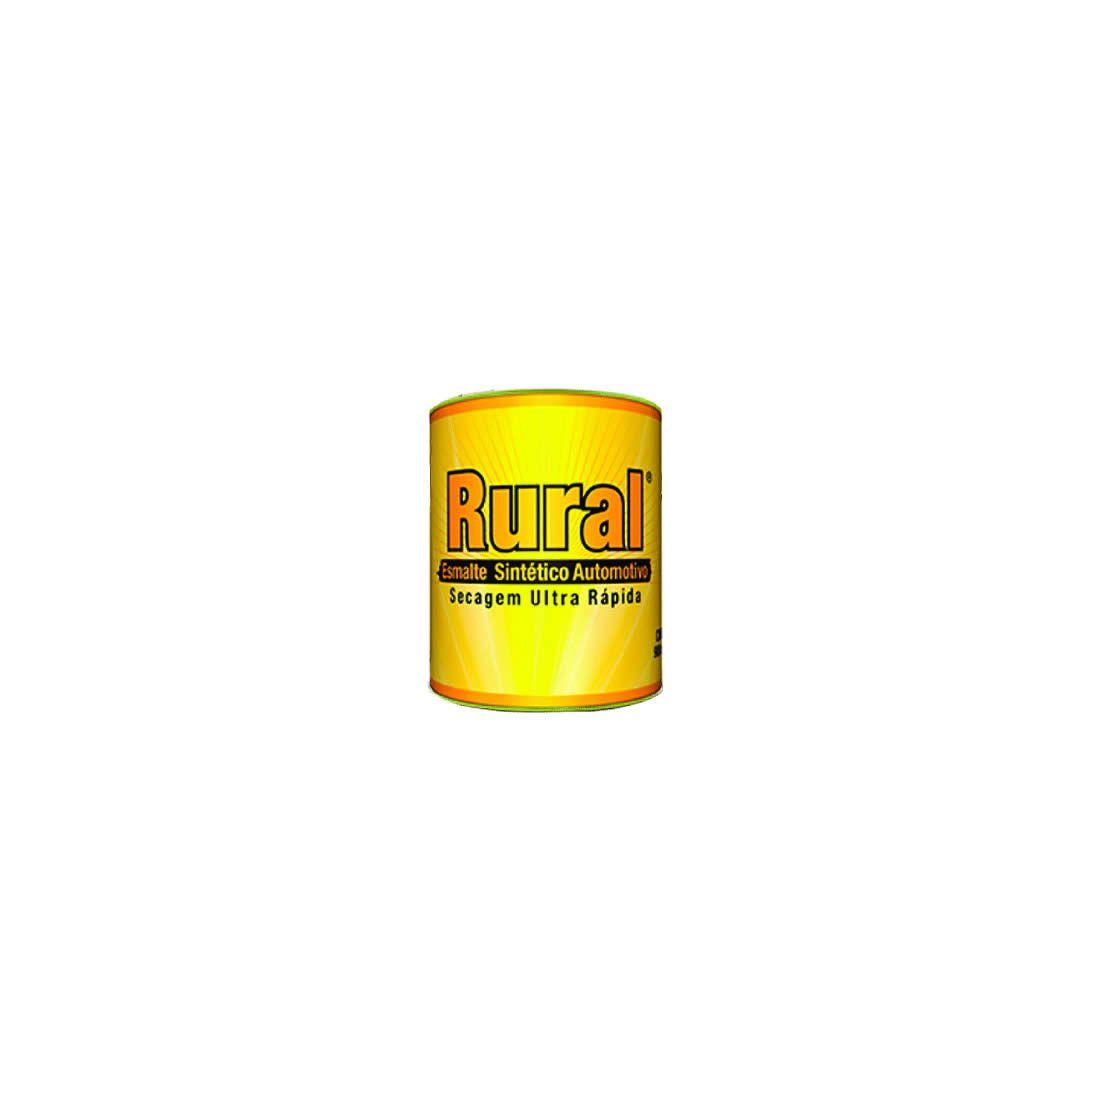 Esmalte Sintético Rural Secagem Ultra Rápido Amarelo Caterpillar 6101 900ml